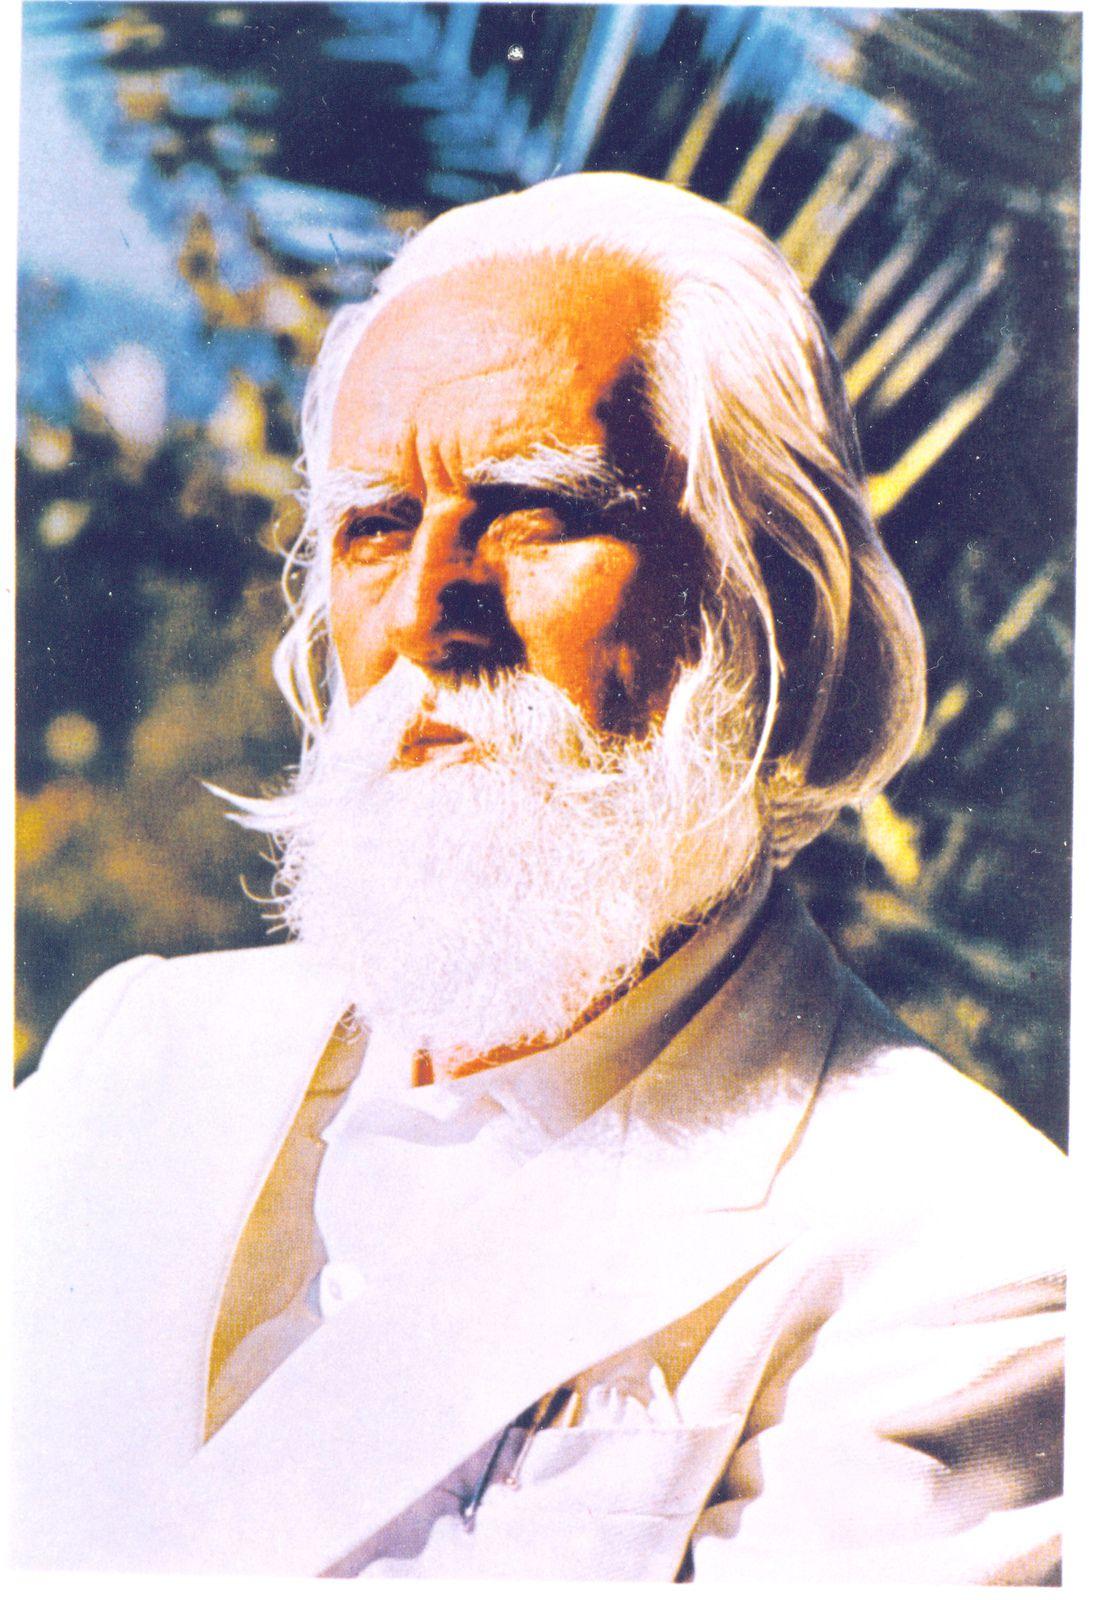 O.M. Aïvanhov